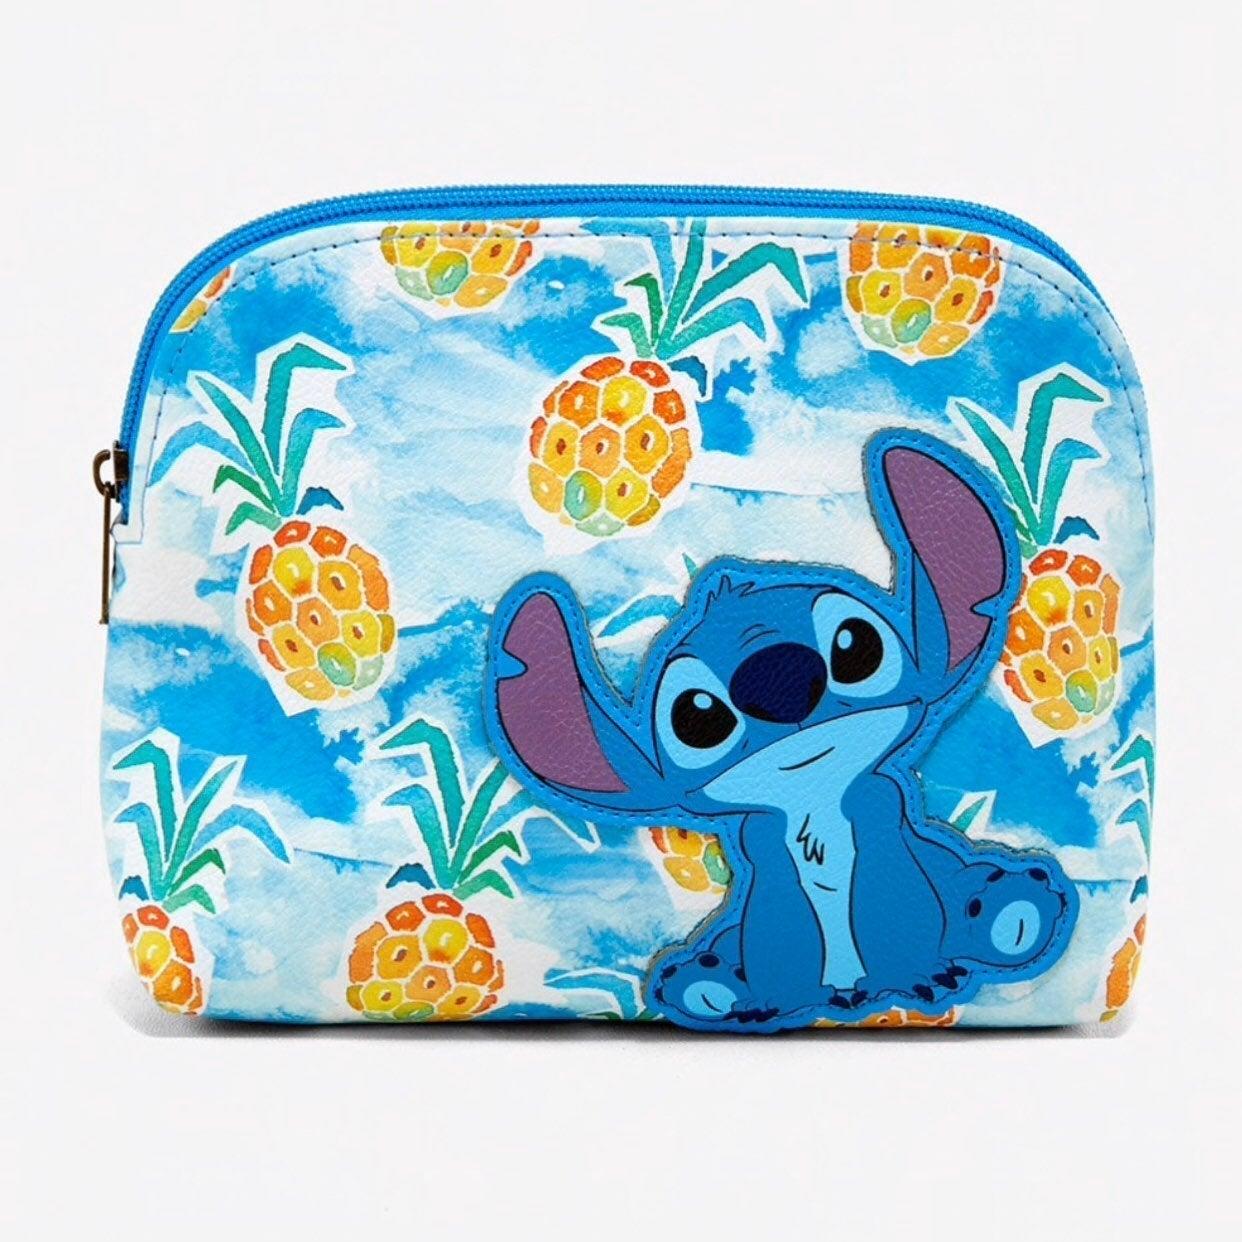 Loungefly Disney Stitch Pineapple Pouch